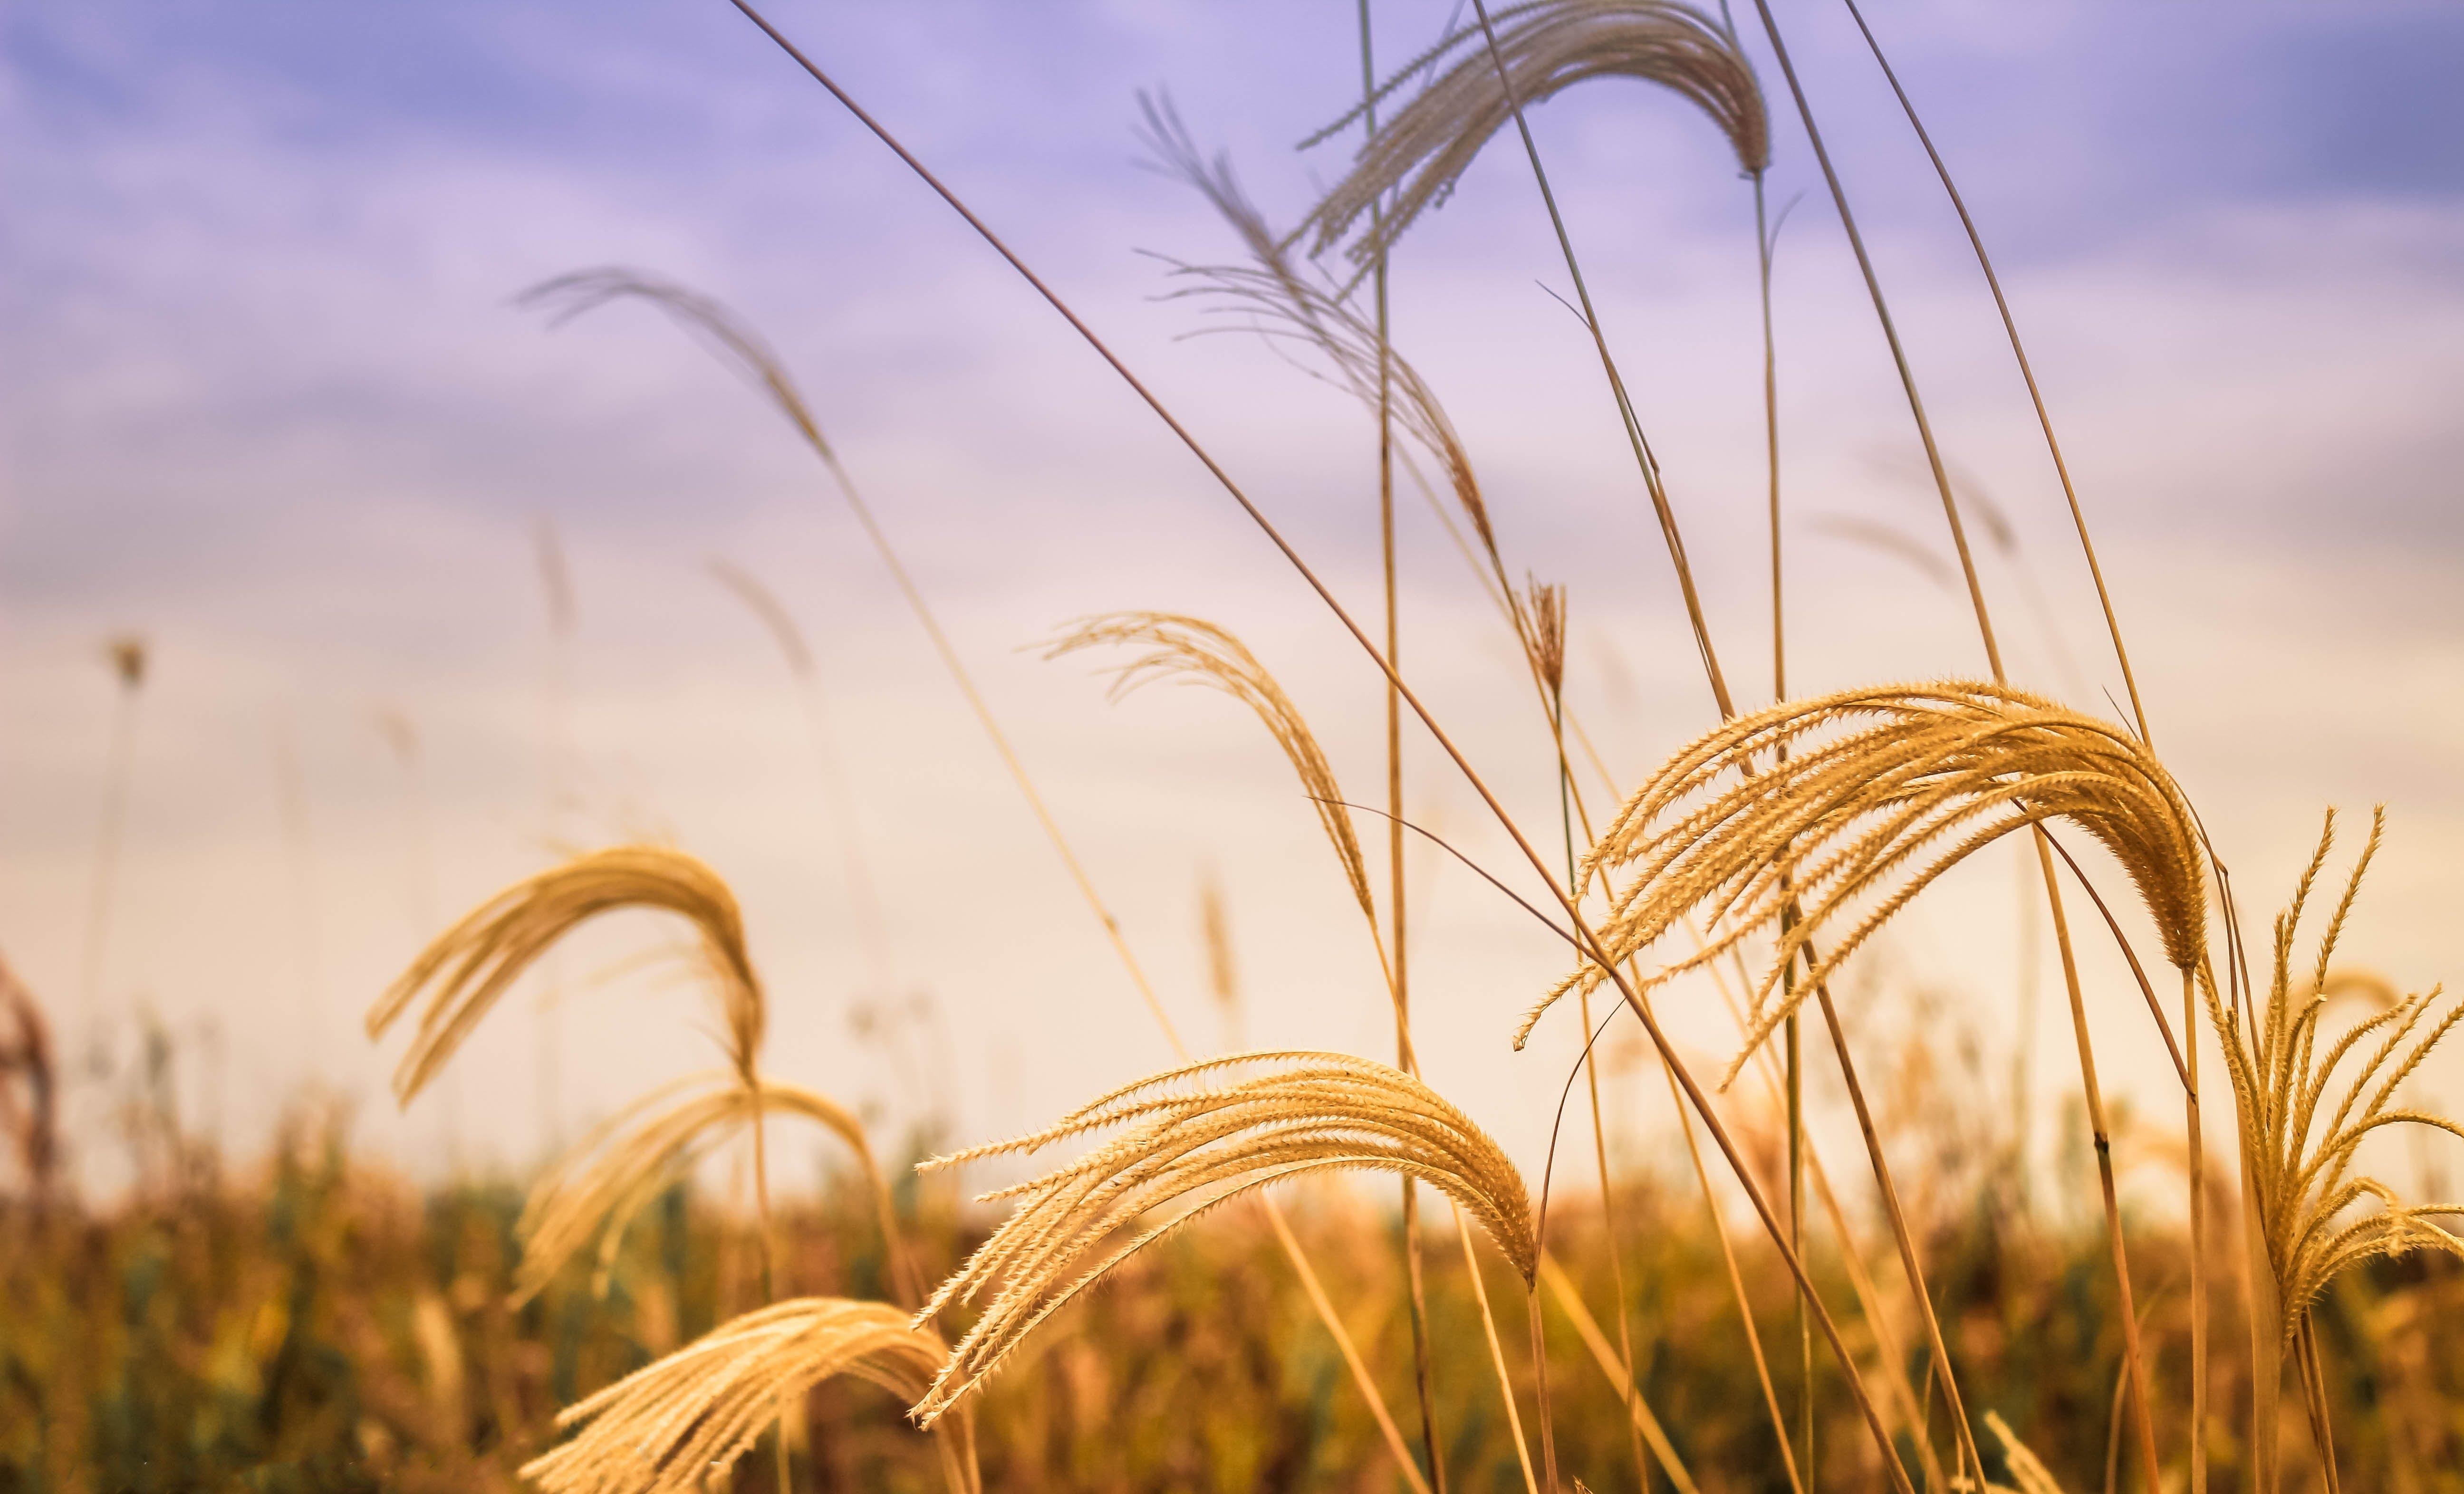 закат, зерновые, лето